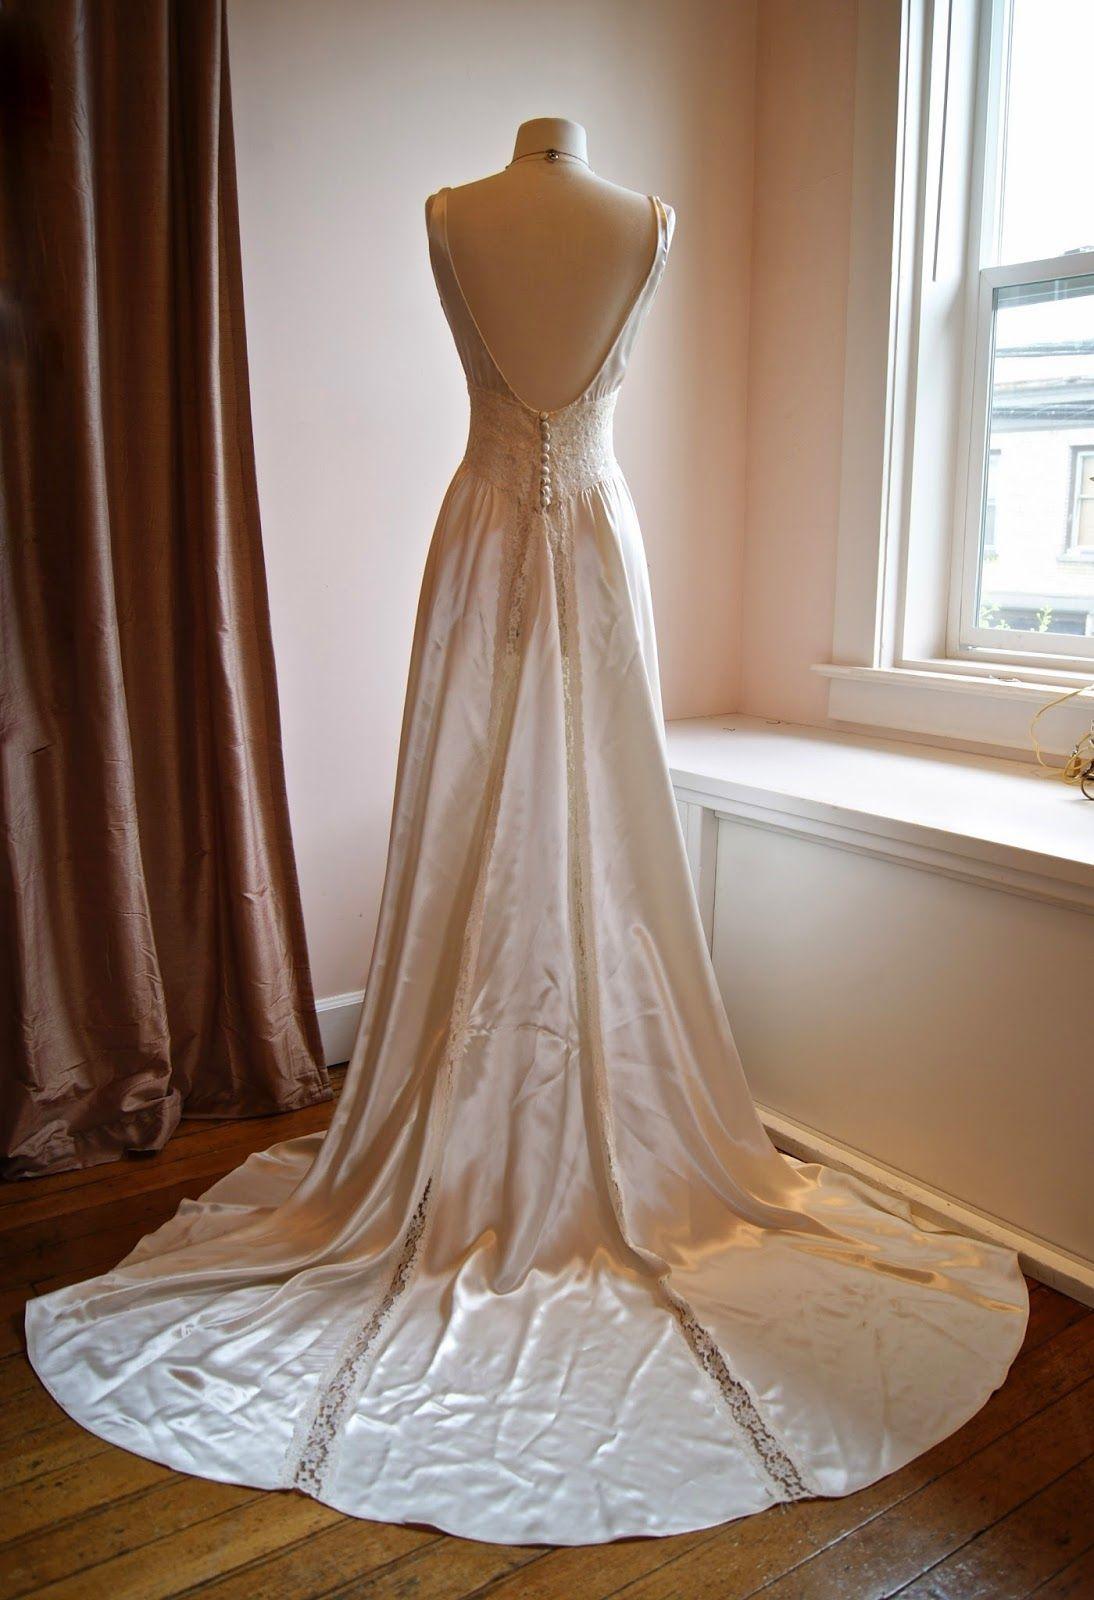 Vintage wedding dress xtabay vintage clothing boutique portland